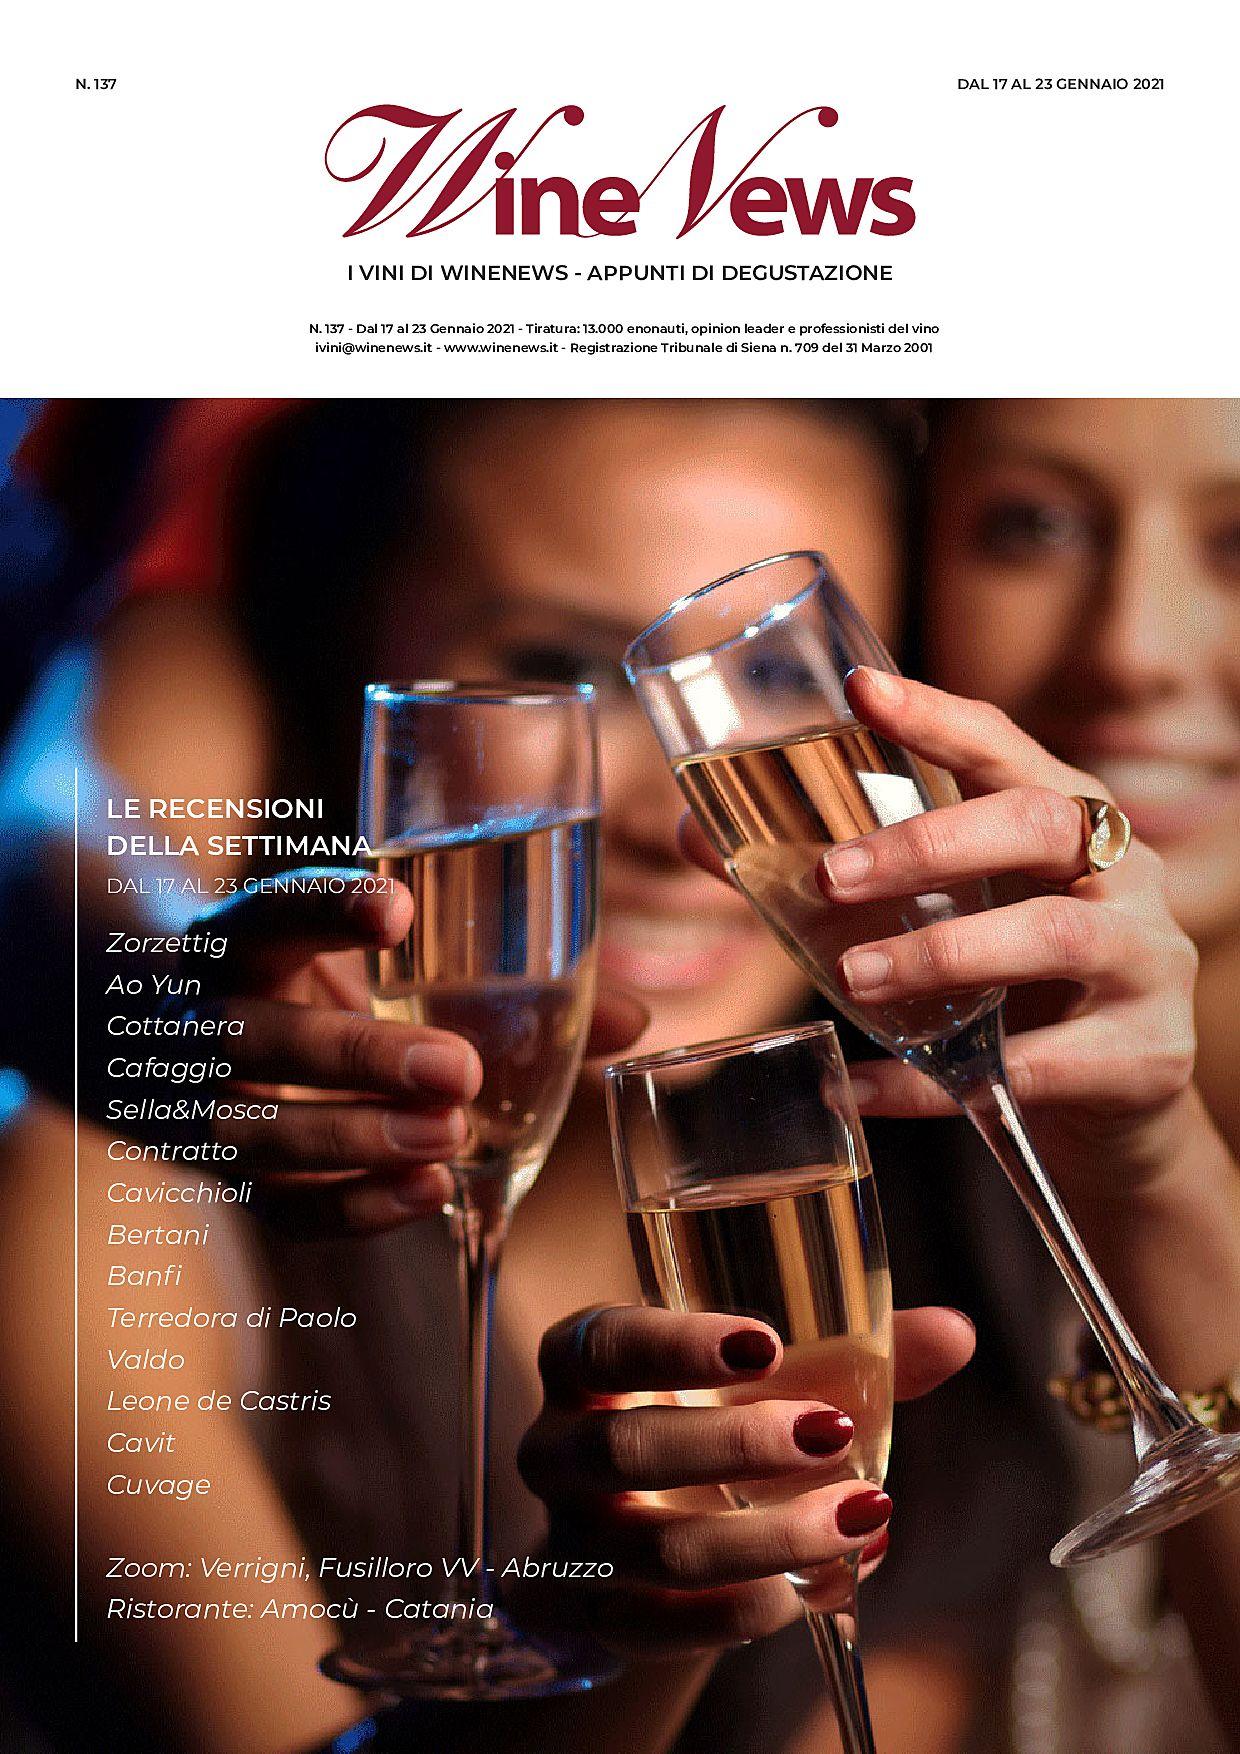 https://winenews.it/php/redirect_pdf.php?id=433977&t=1610740822